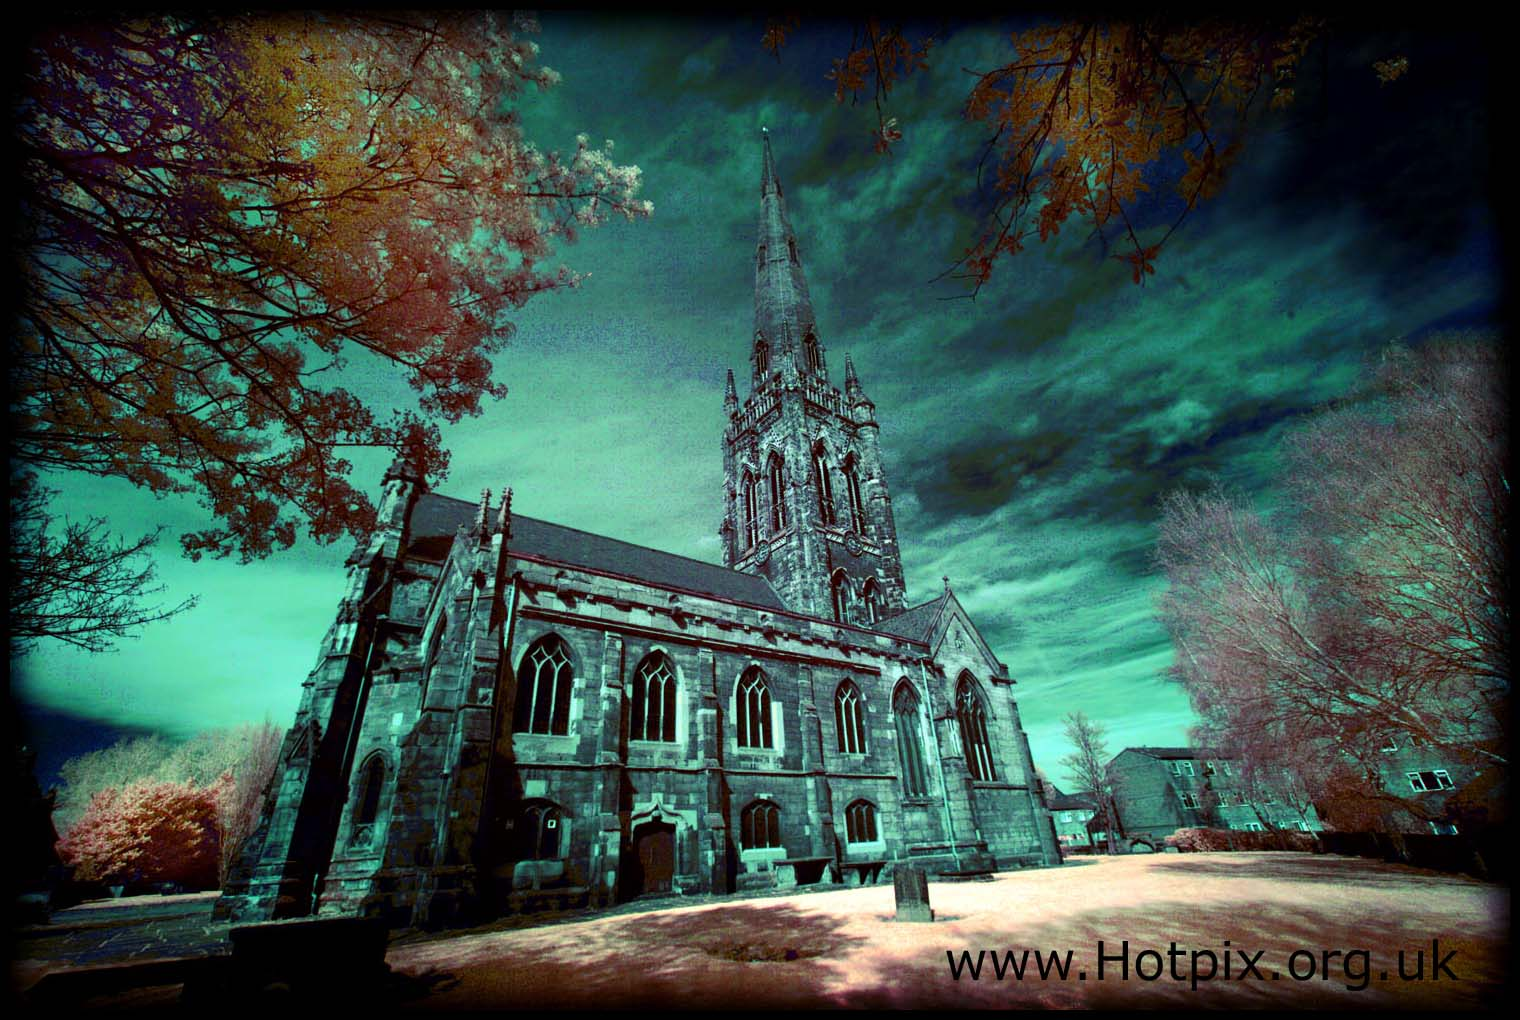 tony,smith,tonysmith,hotpix,tonysmithhotpix,stelphins,st,saint,elphin,elphins,elfins,warrington,town,cheshire,UK,england,chapel,cathedral,colour,color,infra,red,infrared,IR,R72,720nm